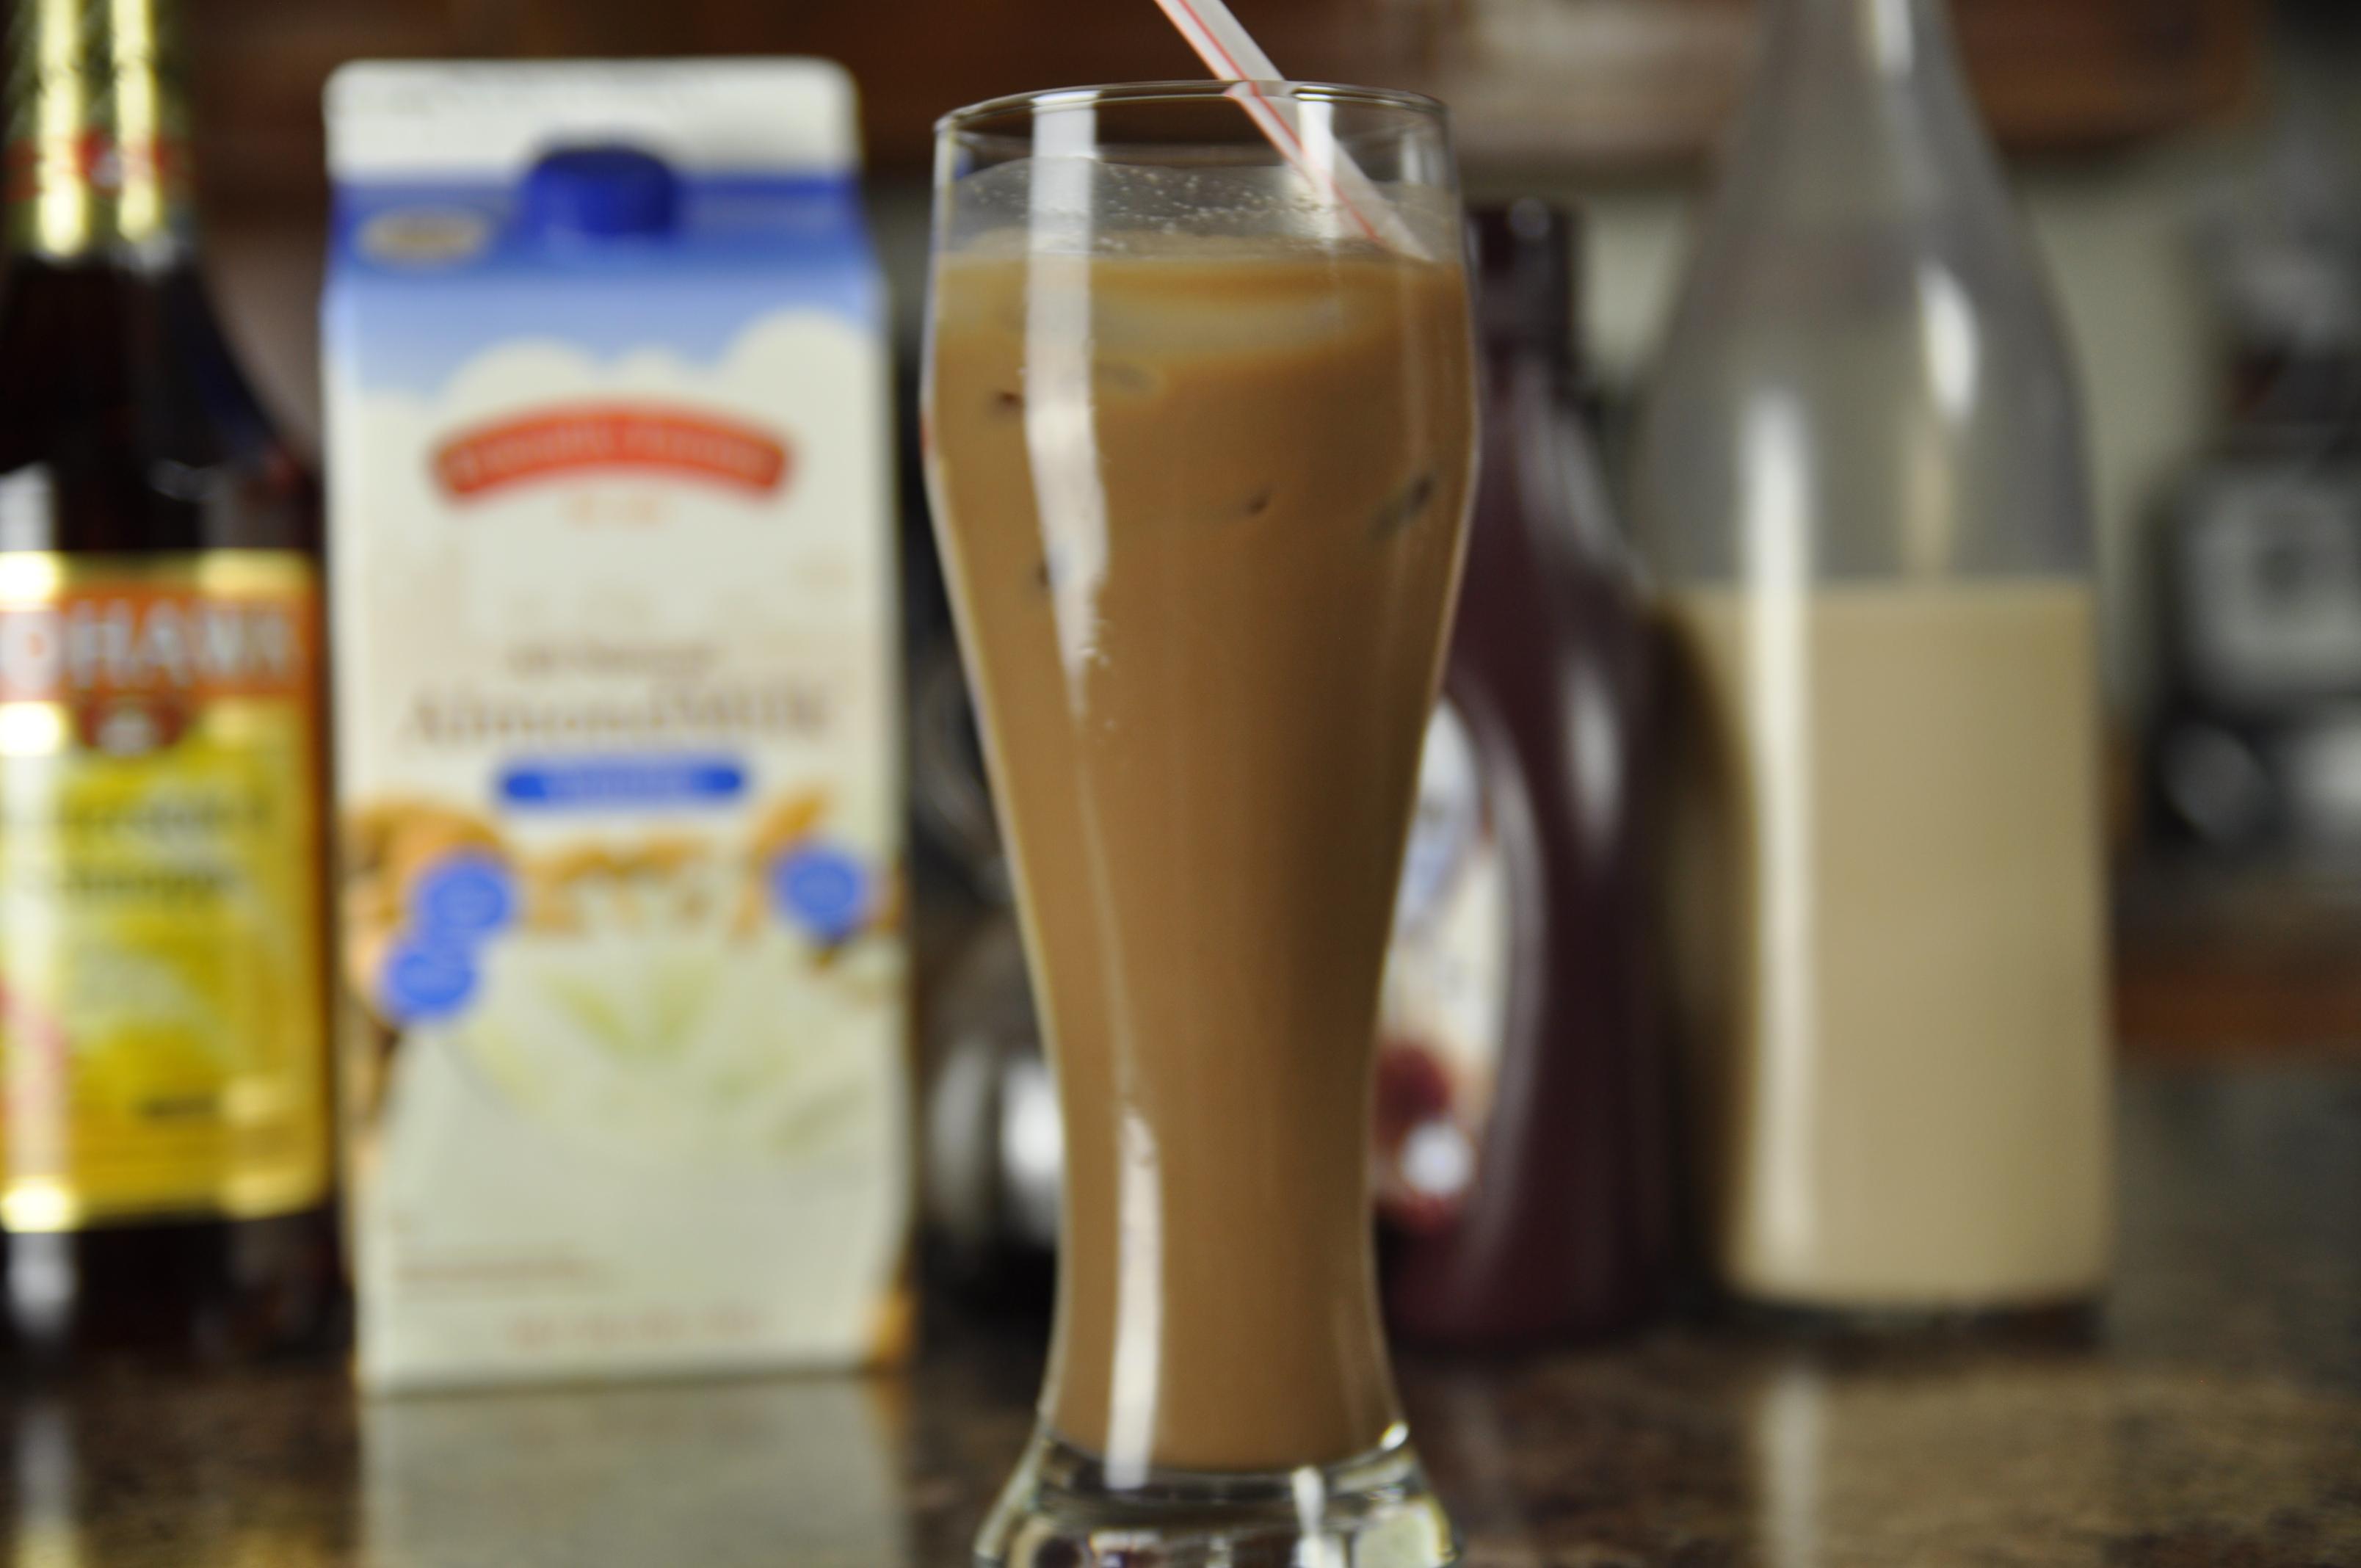 The Blind Russian (Bailey's Irish Cream Mixed Drink)